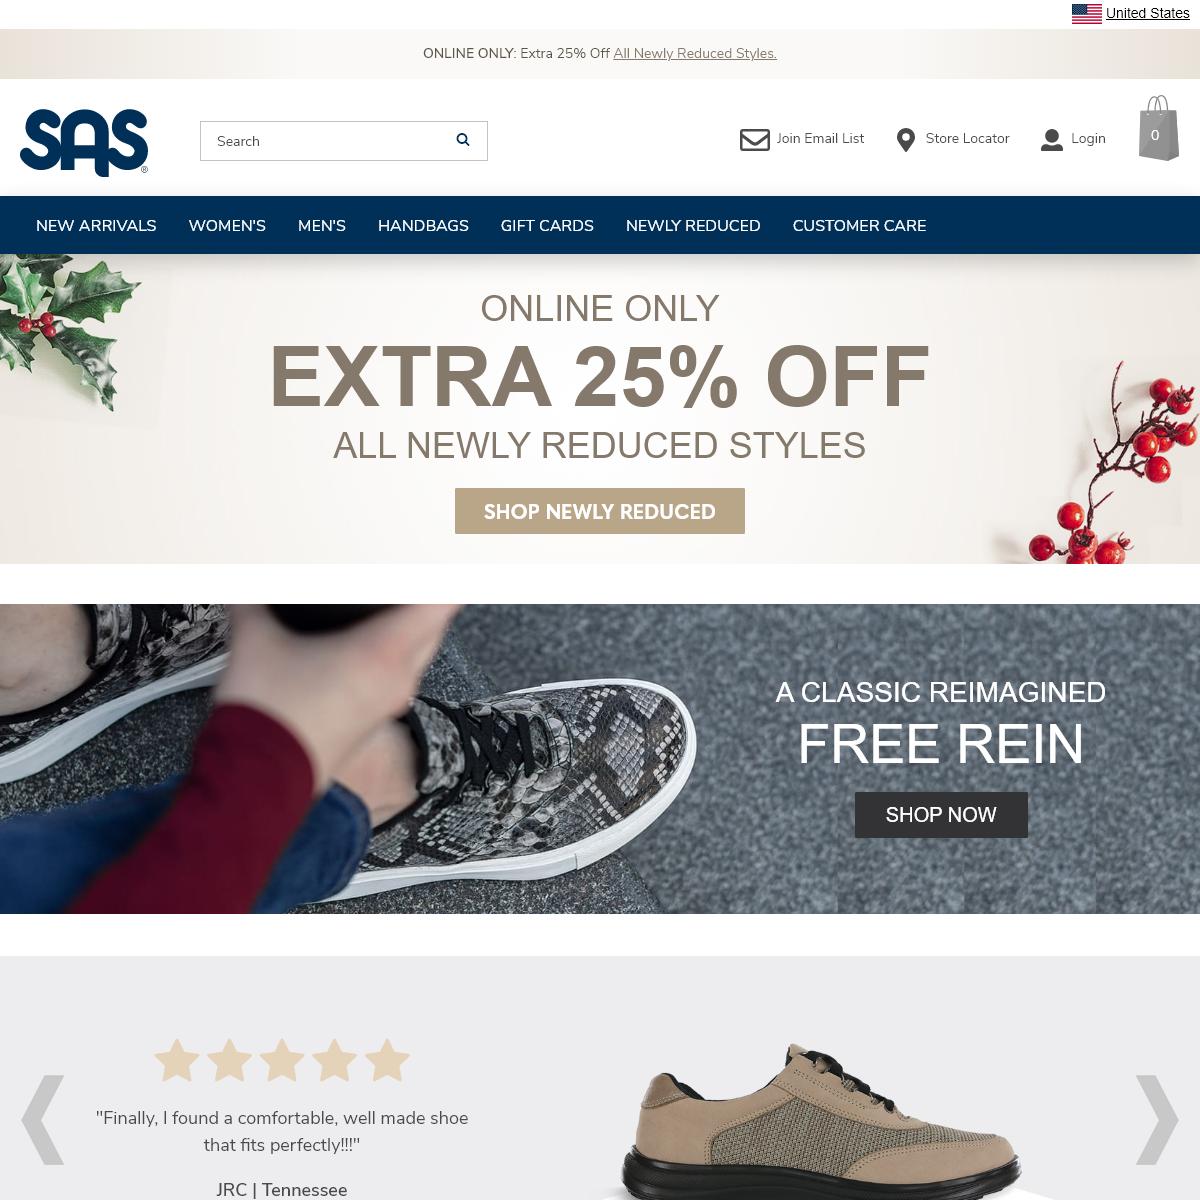 San Antonio Shoemakers - SAS Shoes